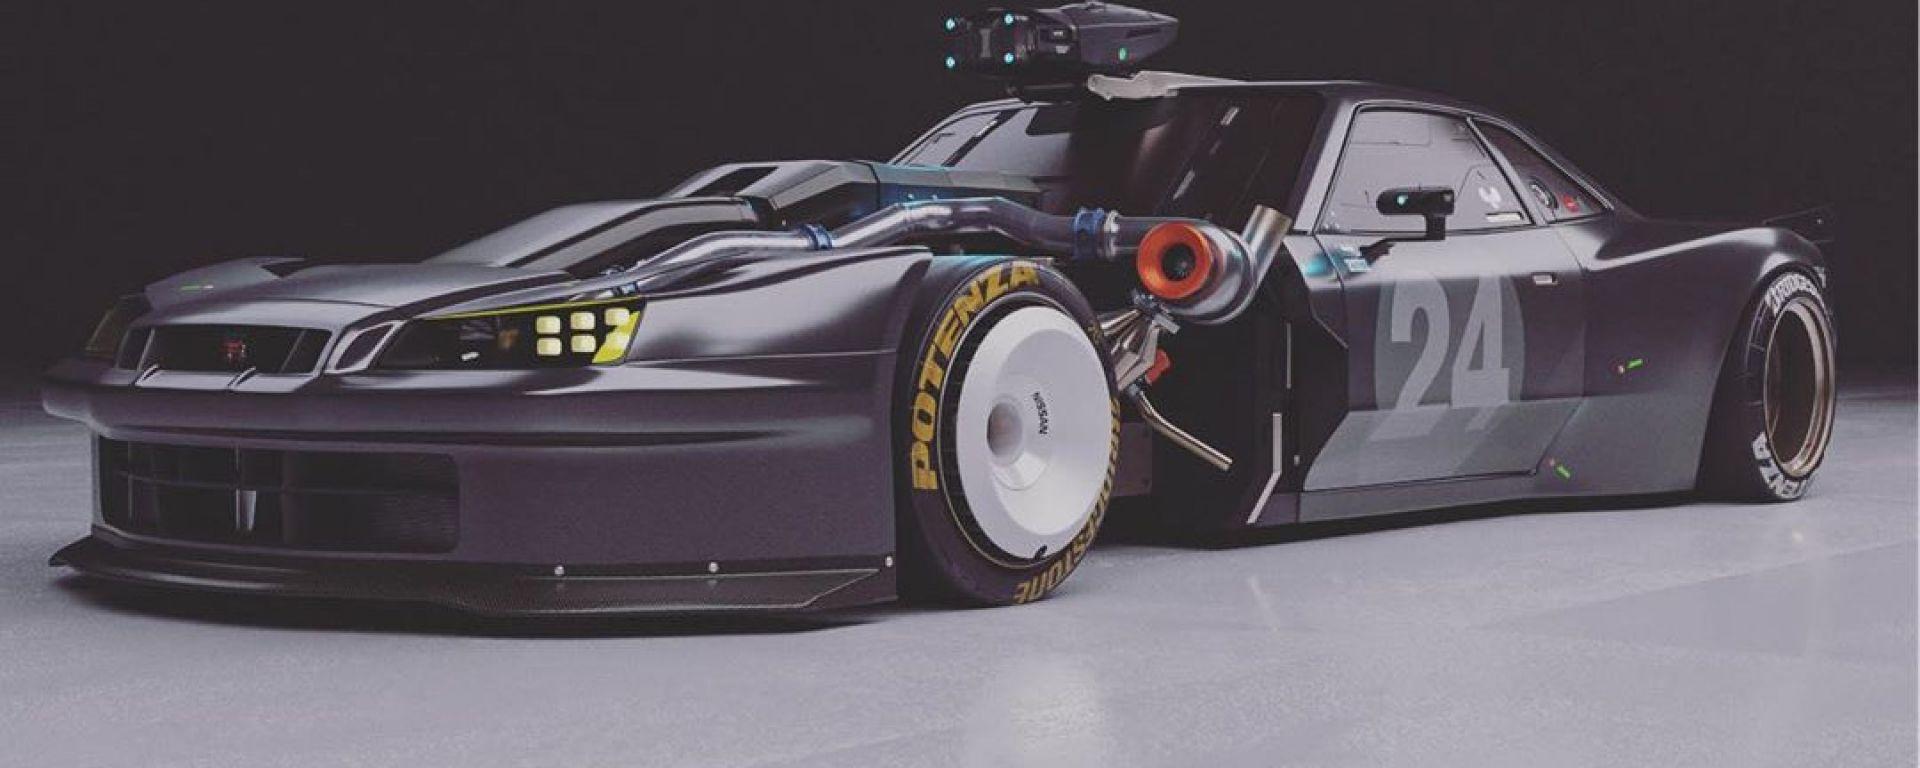 Nissan Skyline GT-R: il renderign più azzardato